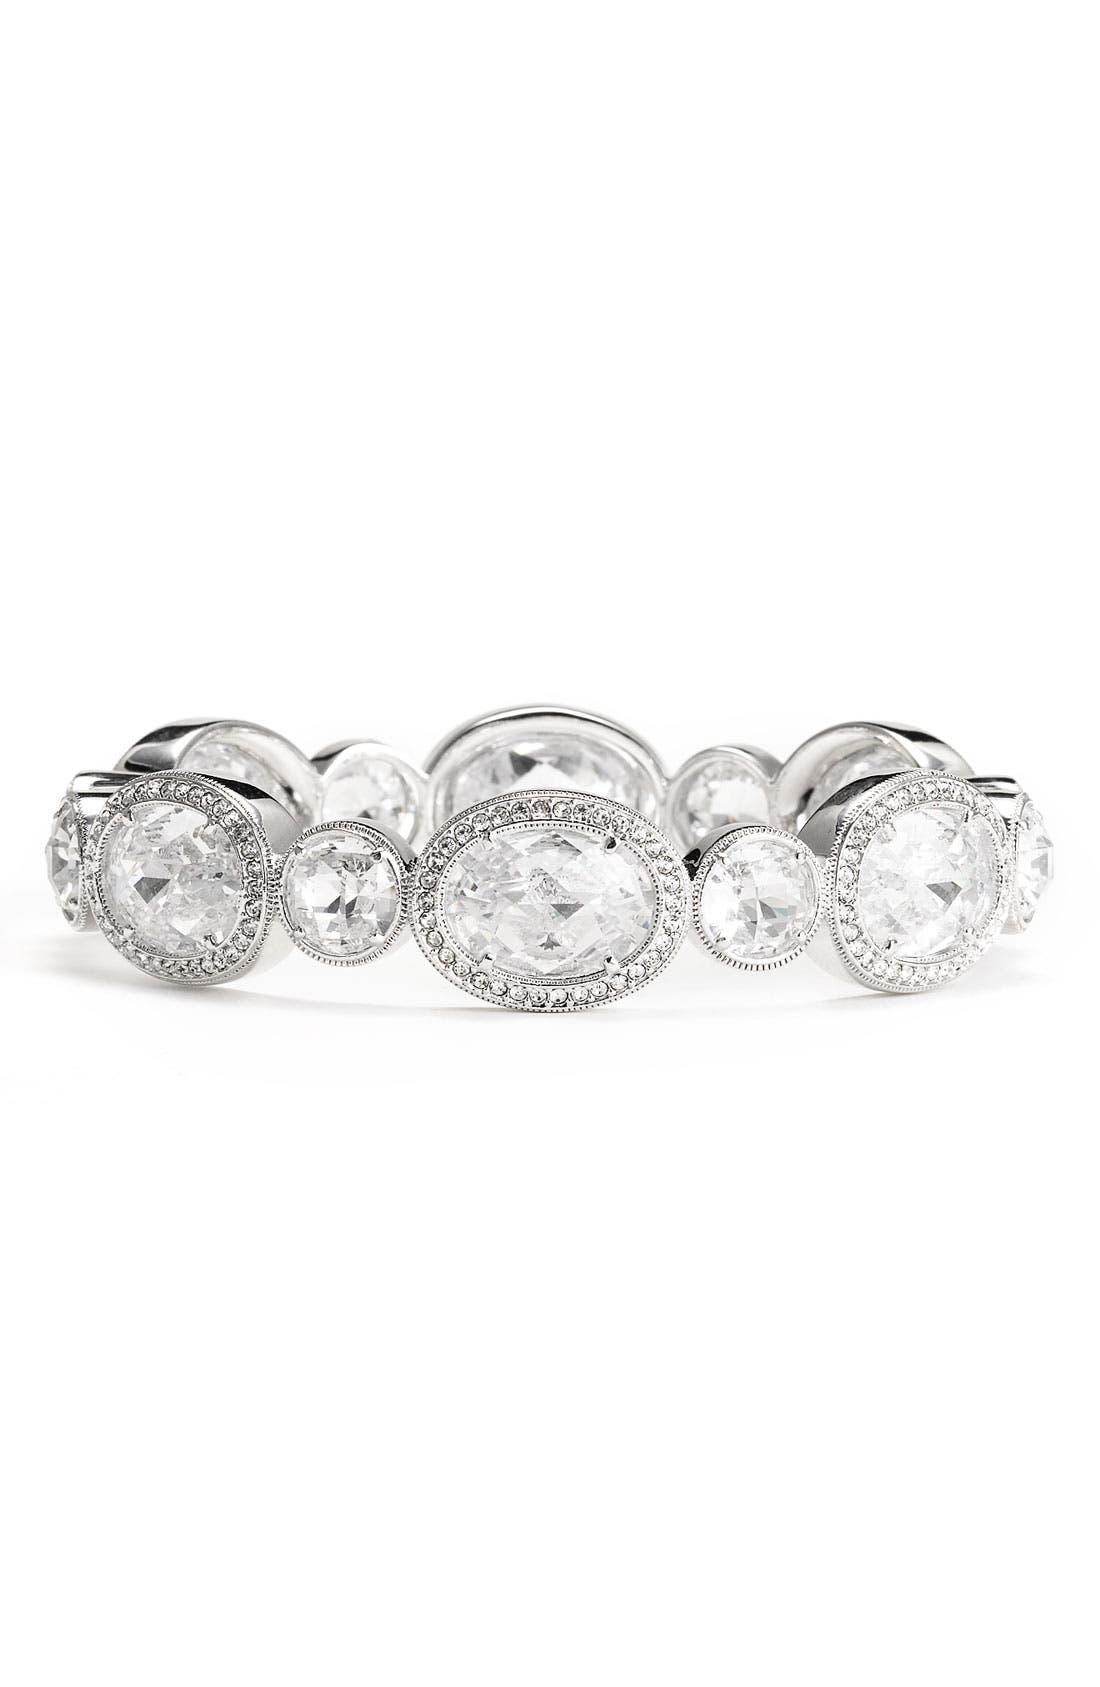 Main Image - Nadri Crystal & Cubic Zirconia Hinged Bangle